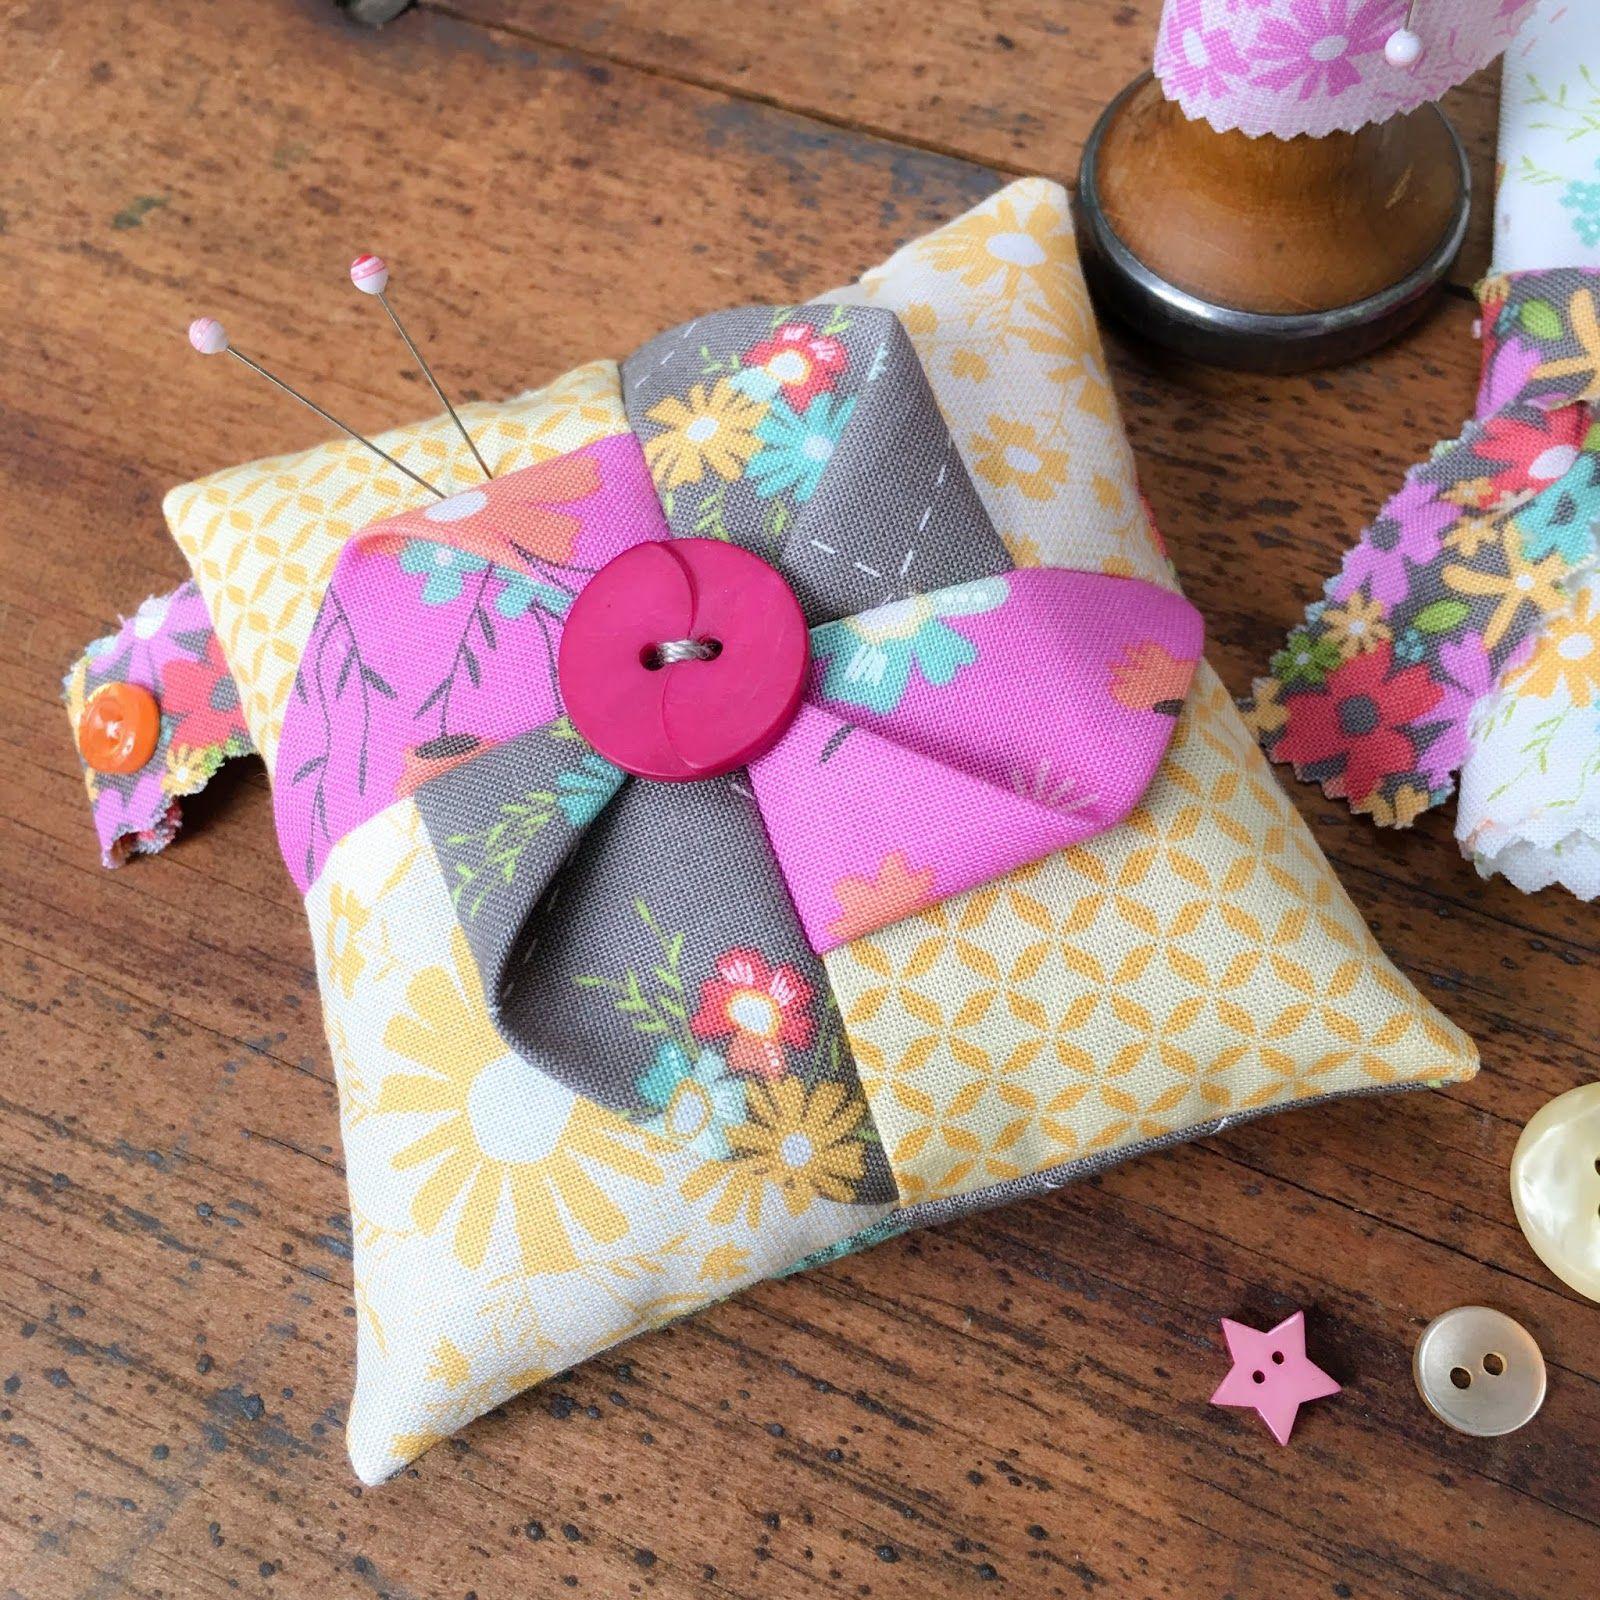 Pin by Vicki Shetter on sewing pincushions | Pin cushions